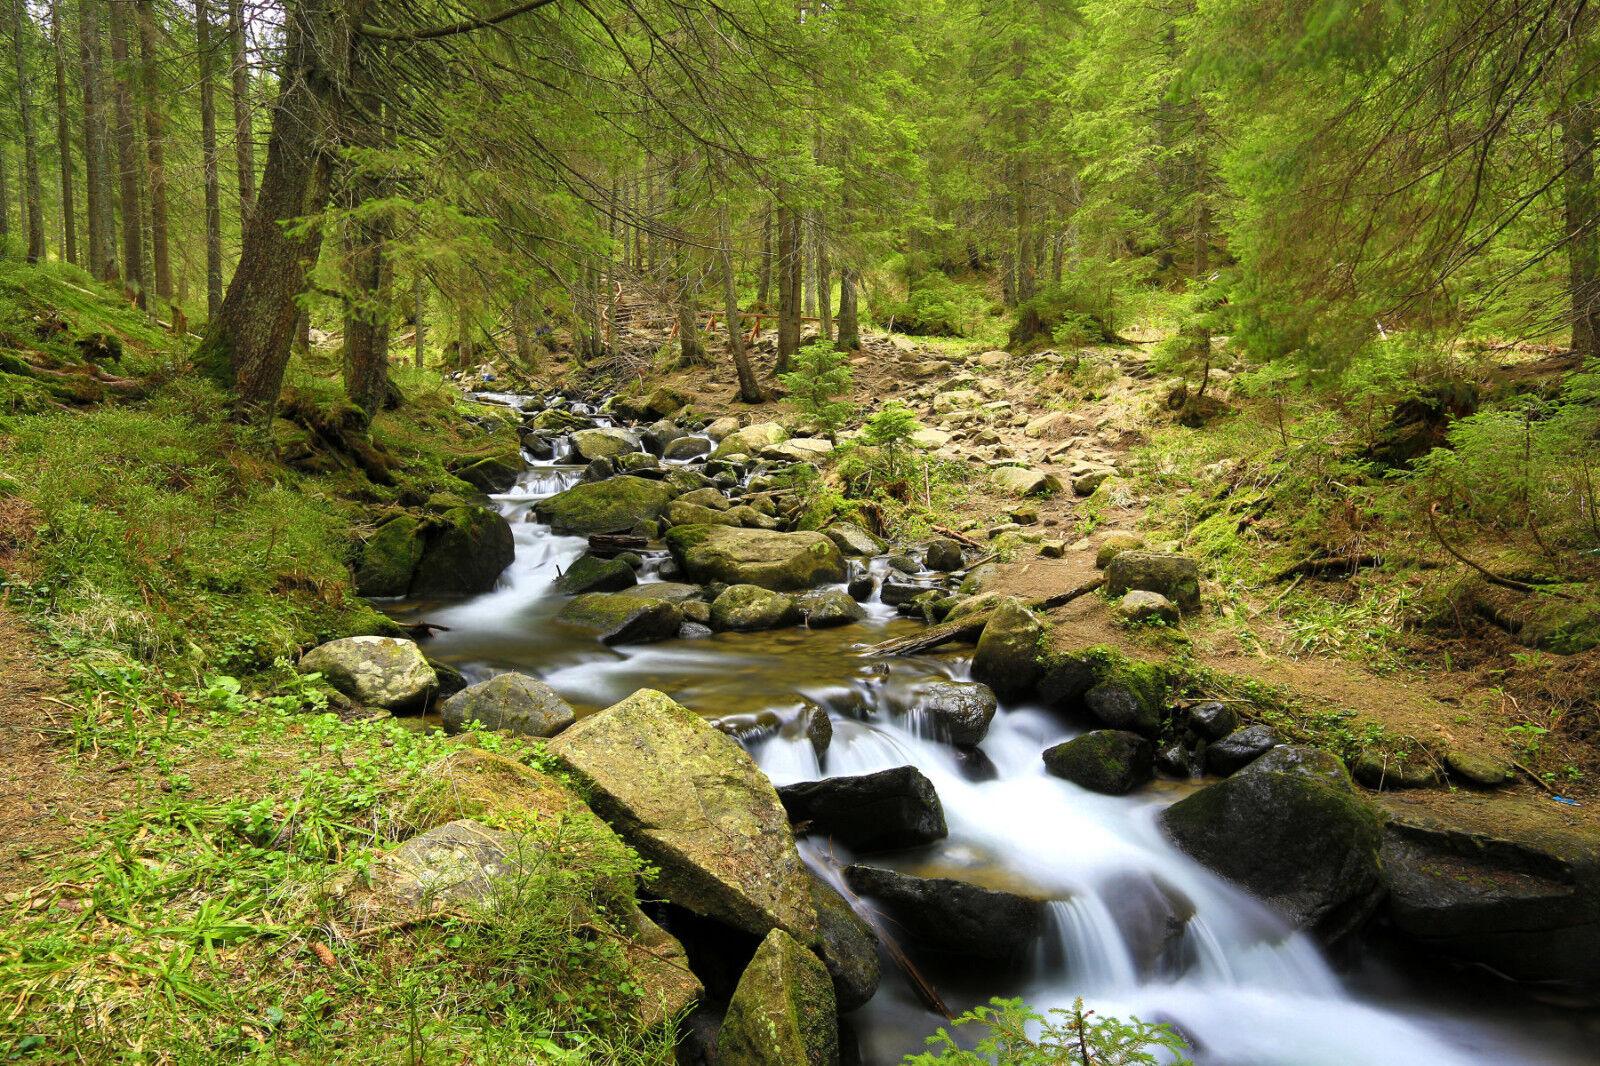 Fototapete-BACH im WALD-(369P)-350x260cm-7 Bahnen 50x260cm-Fluss Steine Bäume